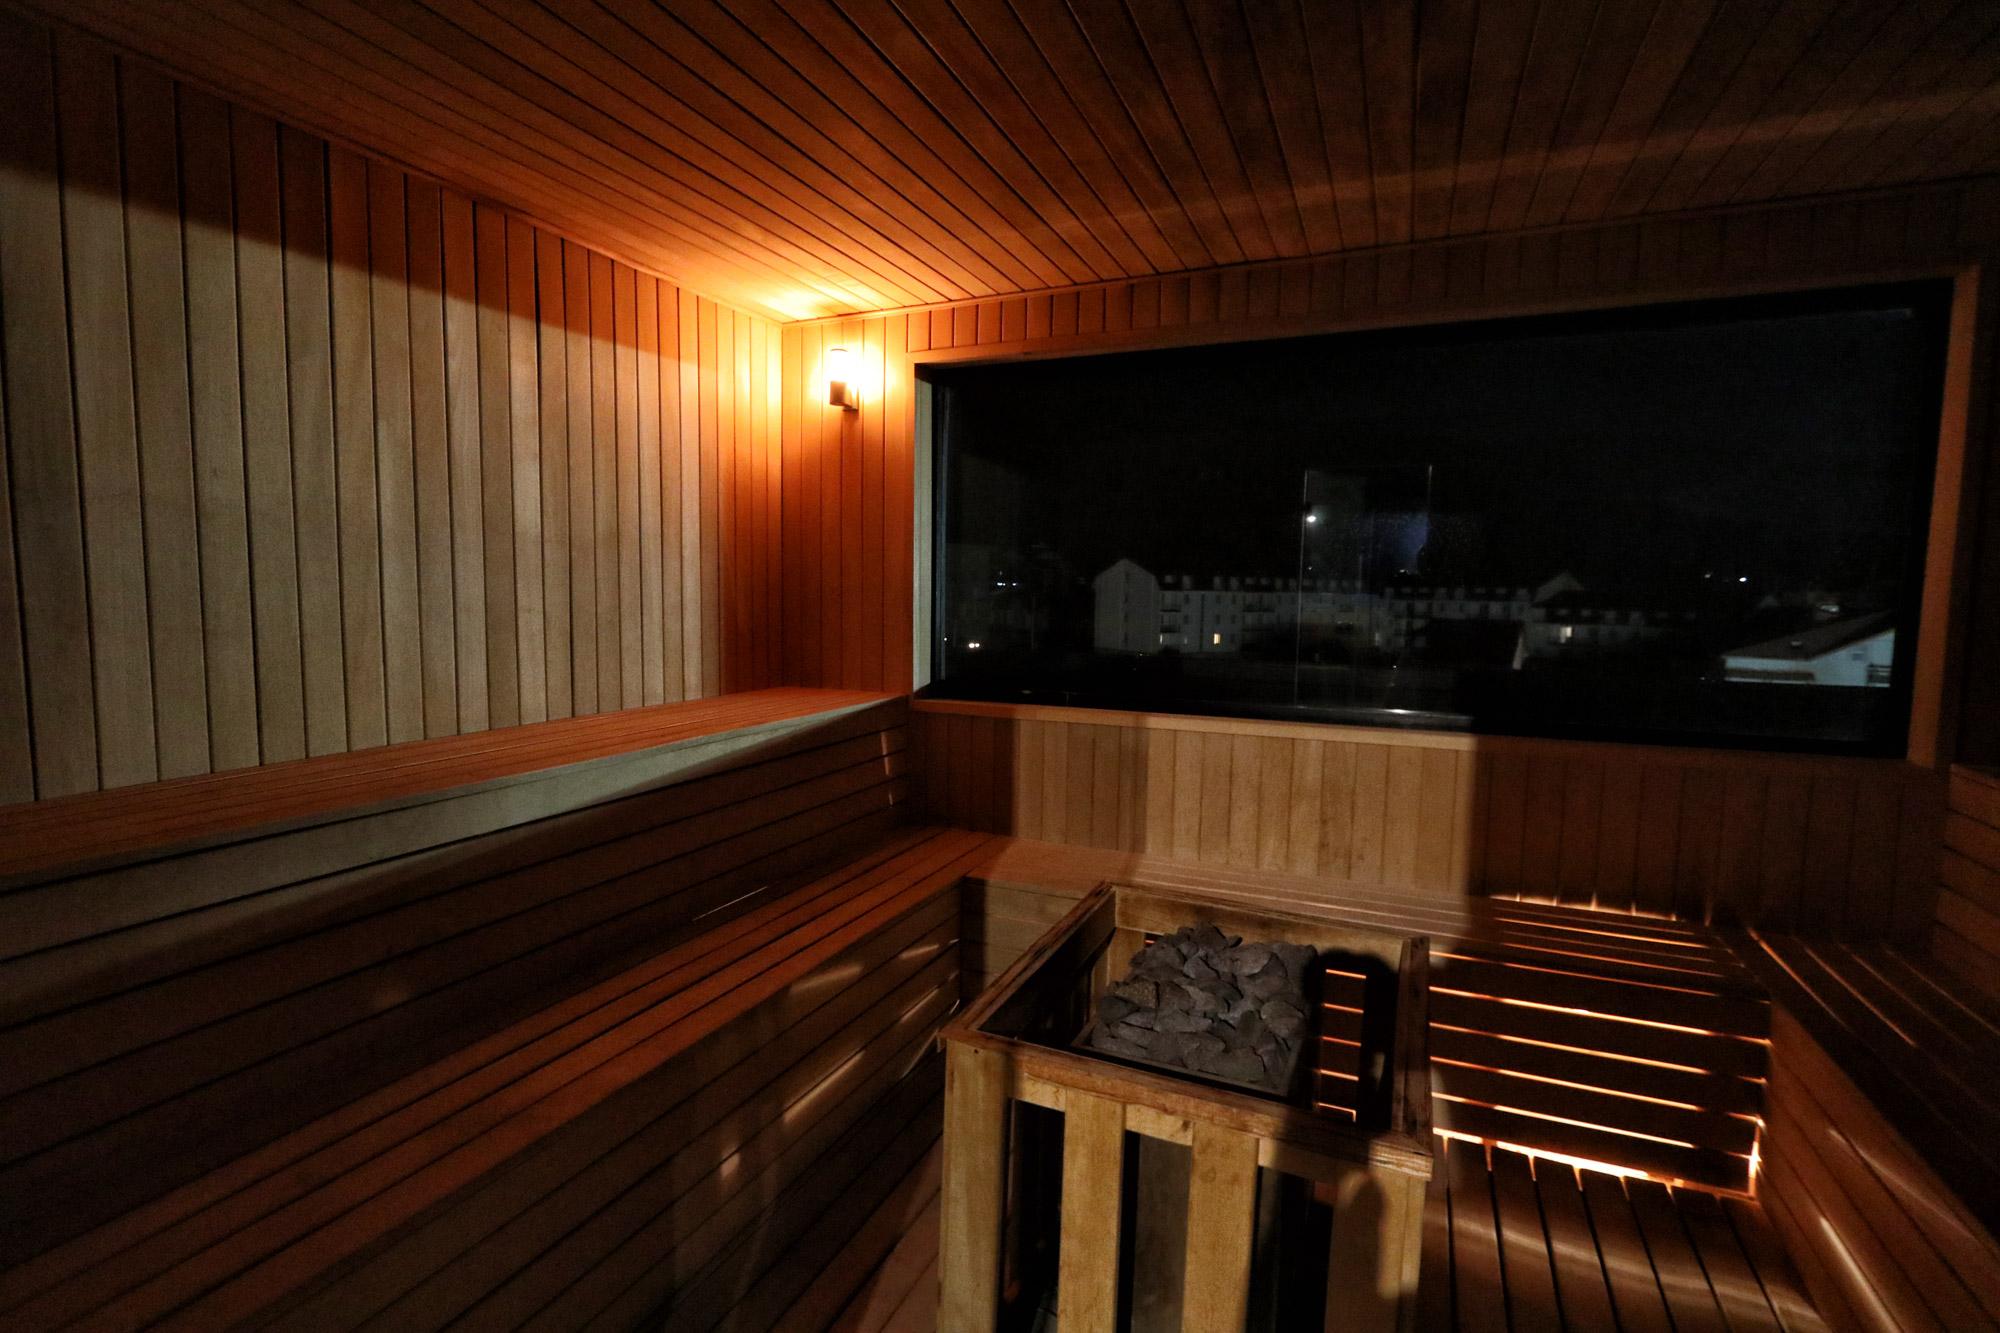 Georgie Reisverslag - Hotel Terrace 8